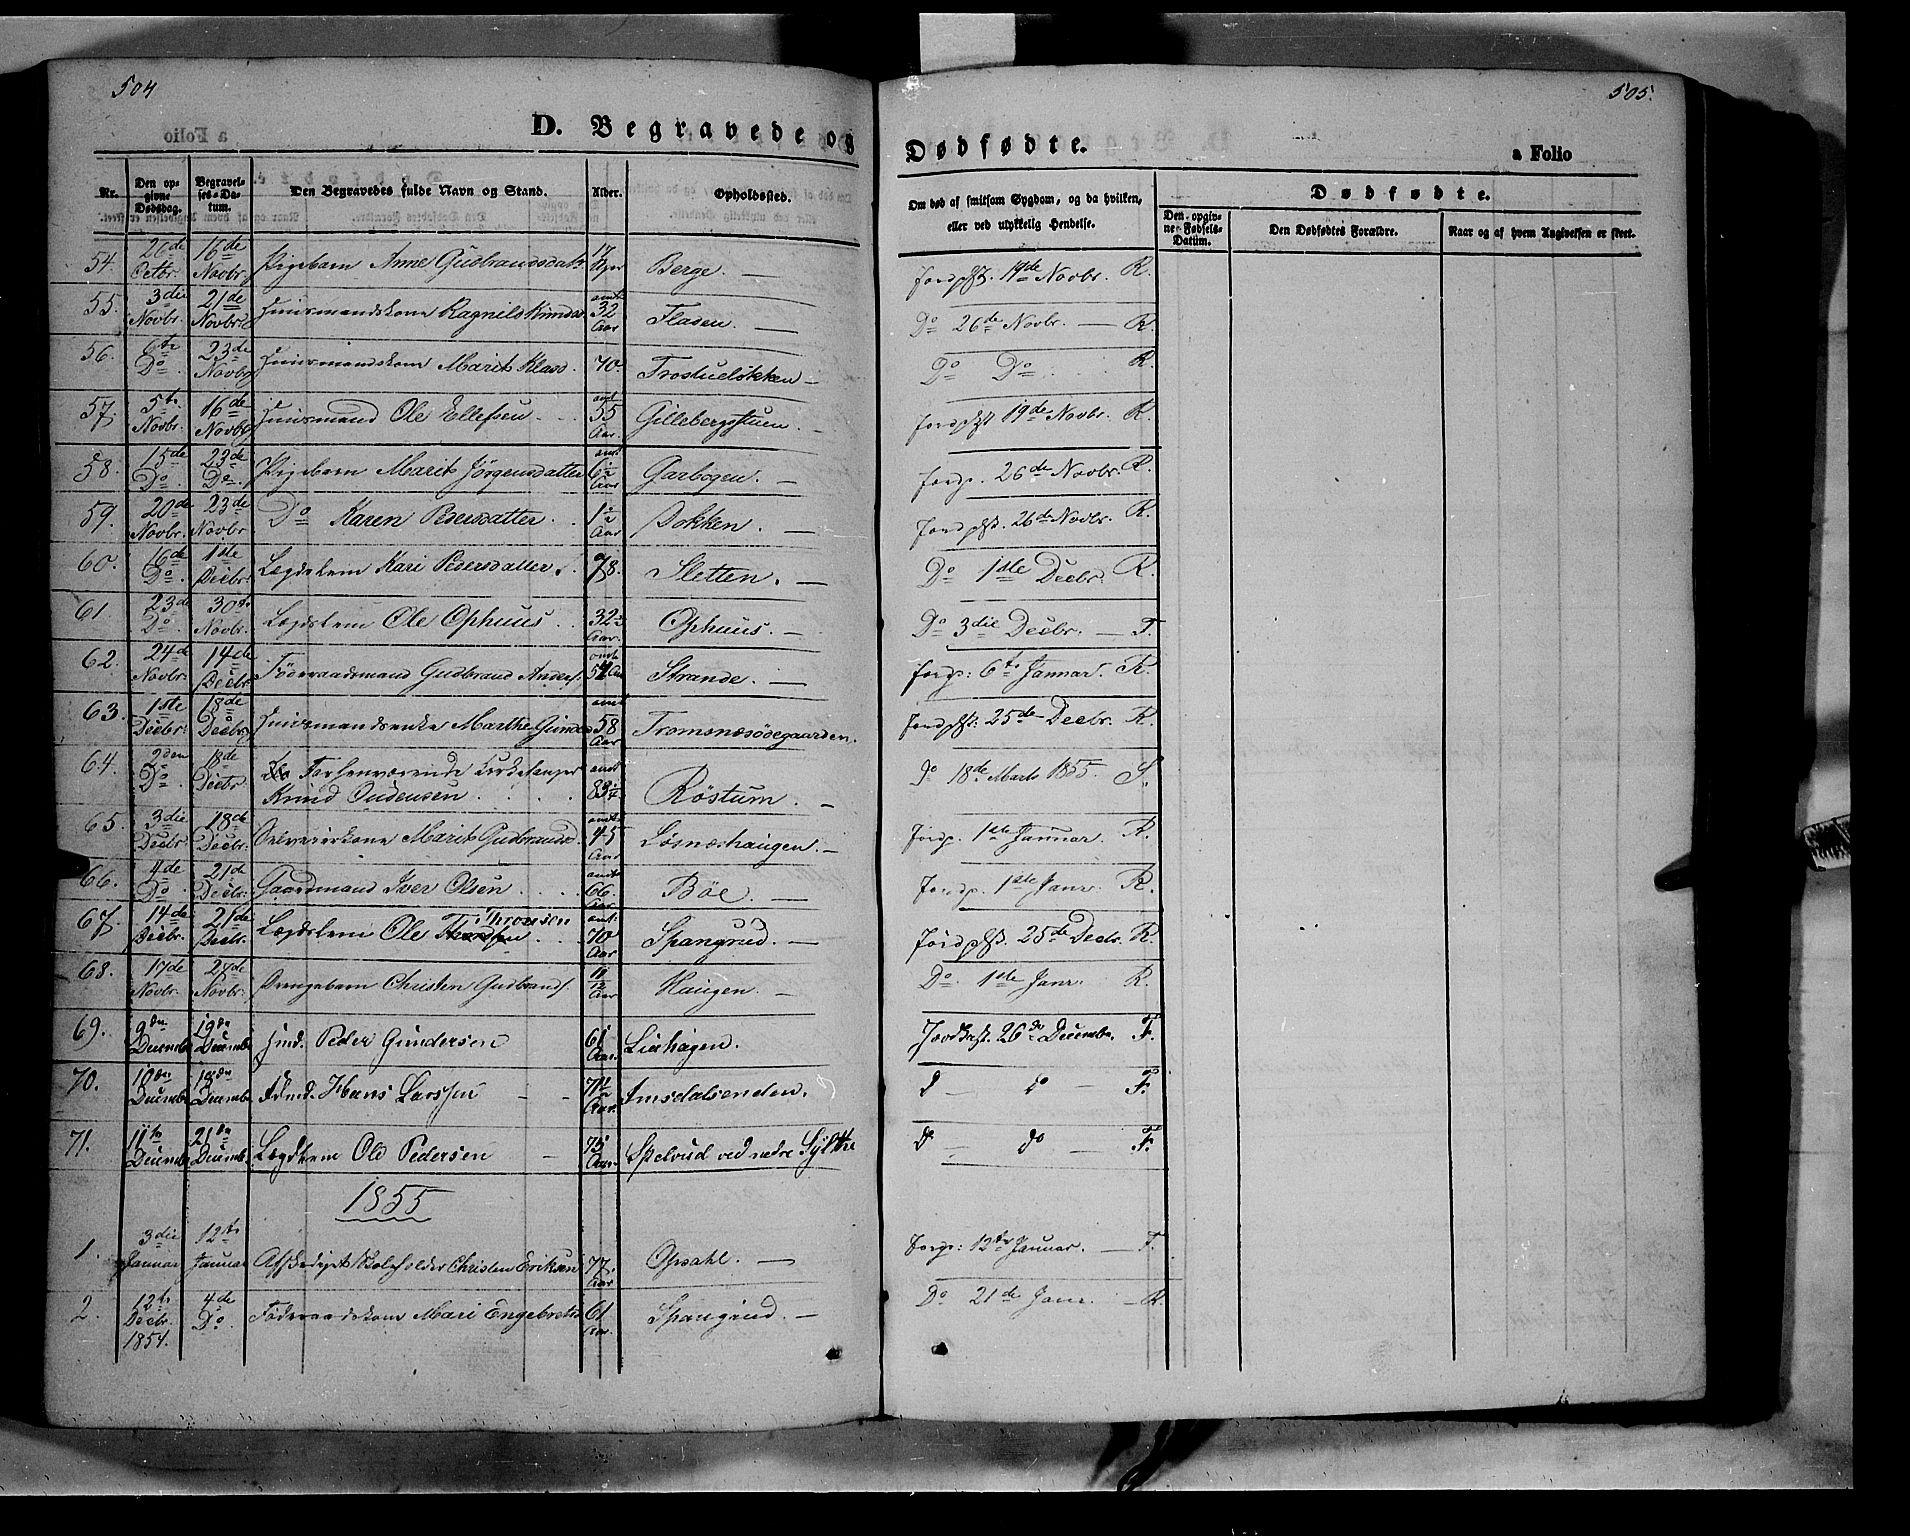 SAH, Ringebu prestekontor, Ministerialbok nr. 6, 1848-1859, s. 504-505